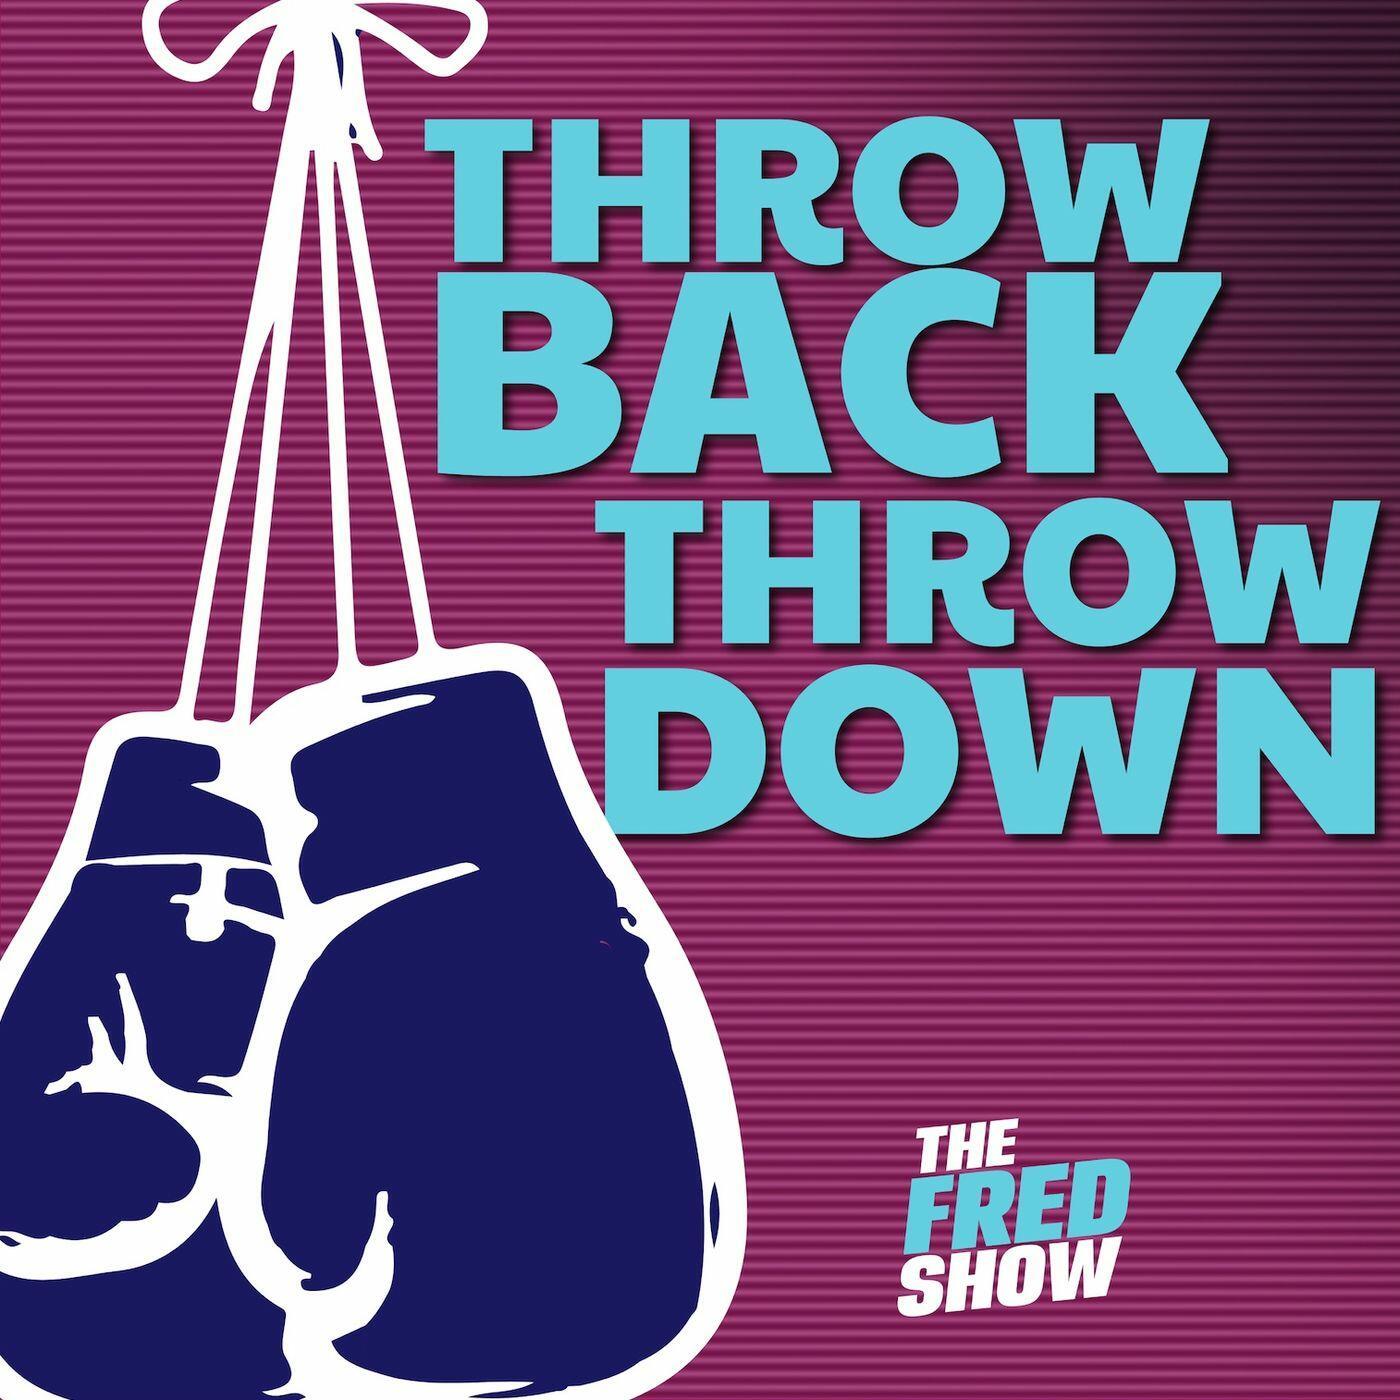 The Fred Show Throwback Throwdown